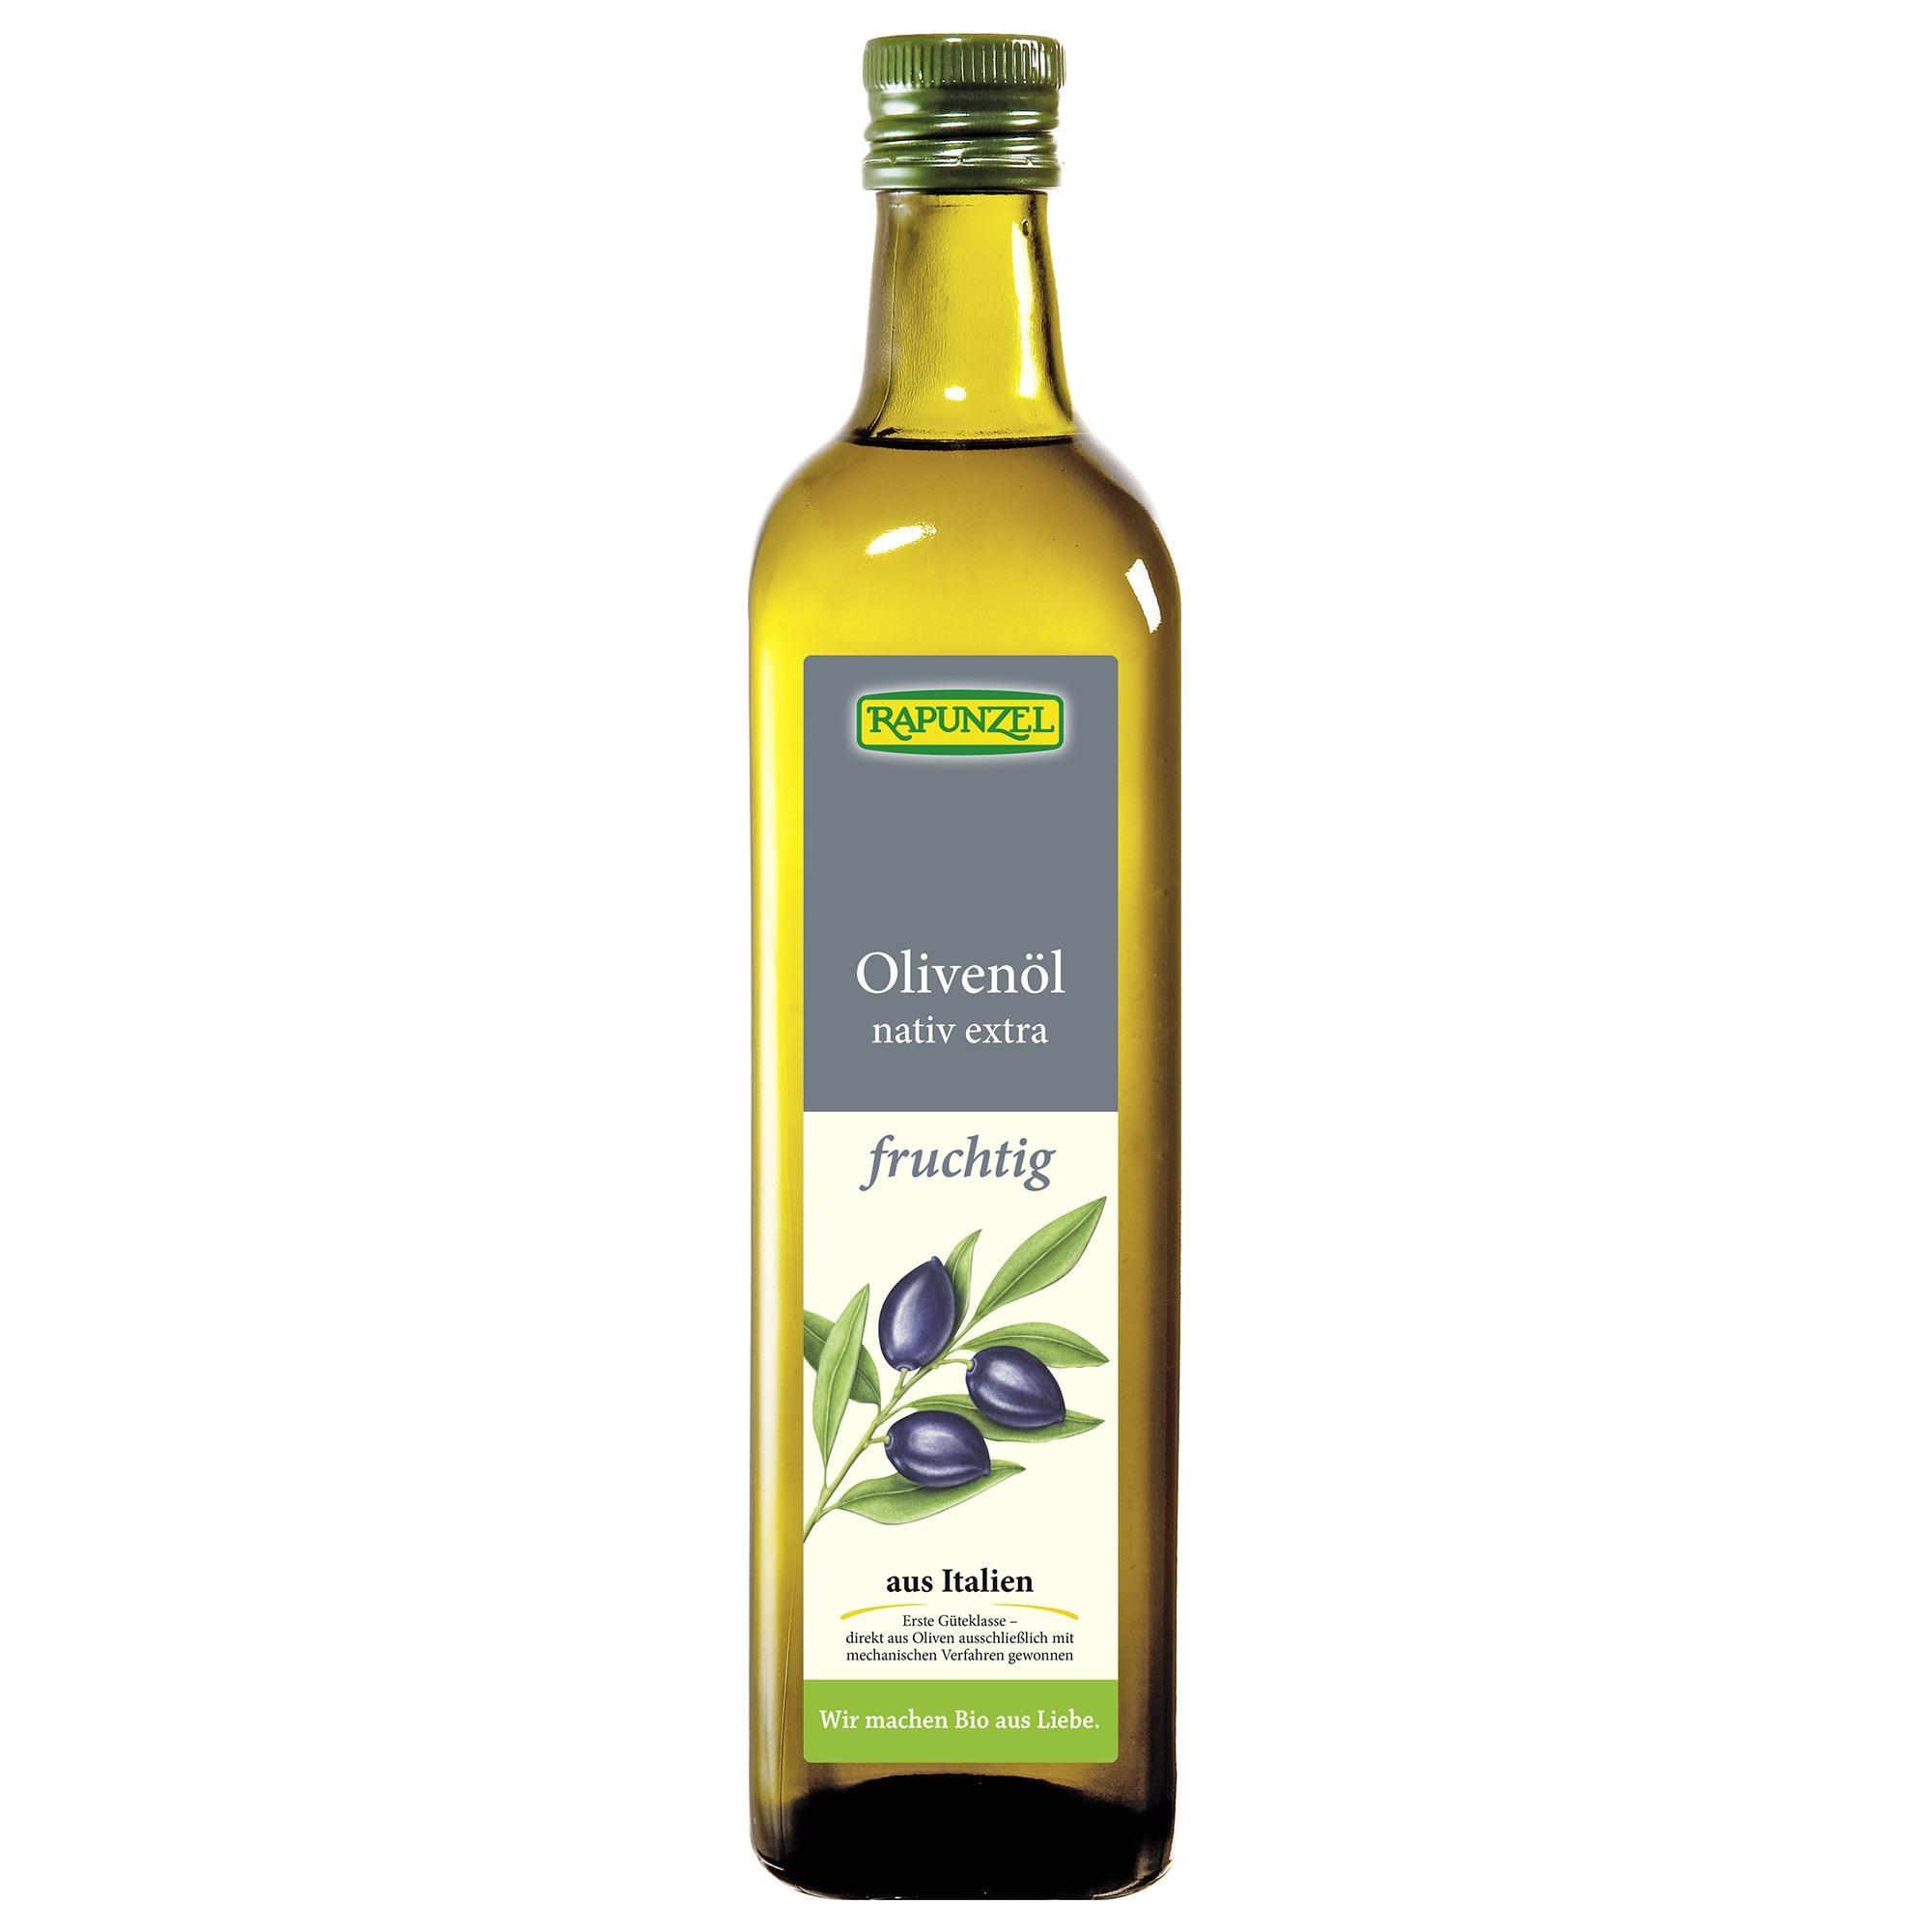 Rapunzel Bio Olivenöl fruchtig nativ extra 0,75l